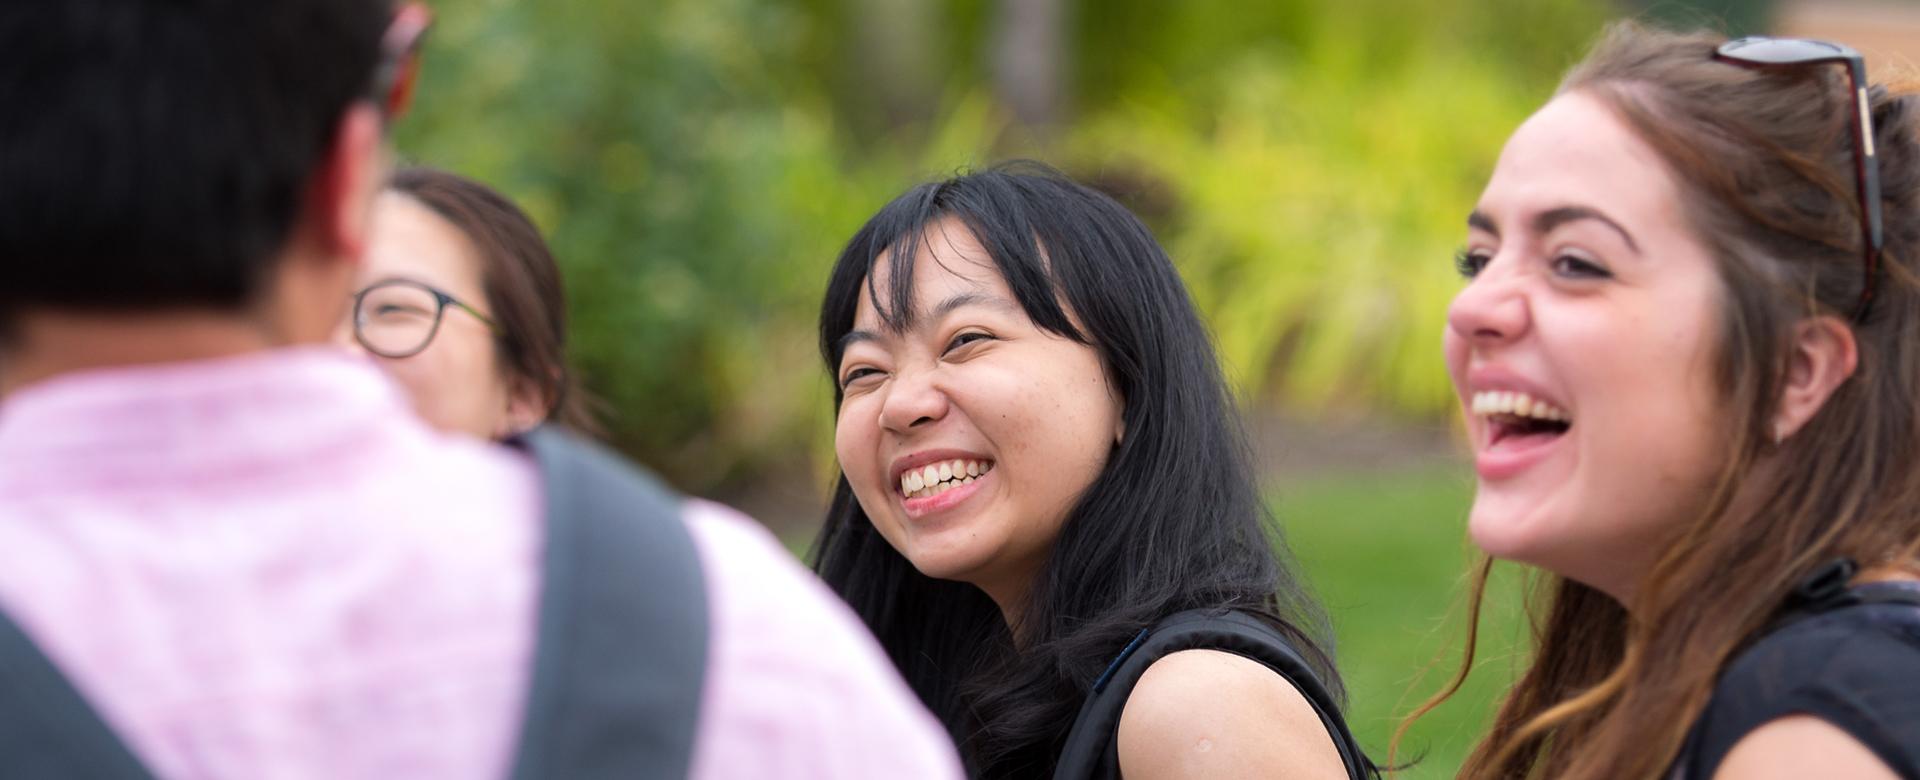 student laughing and enjoying ubco student life